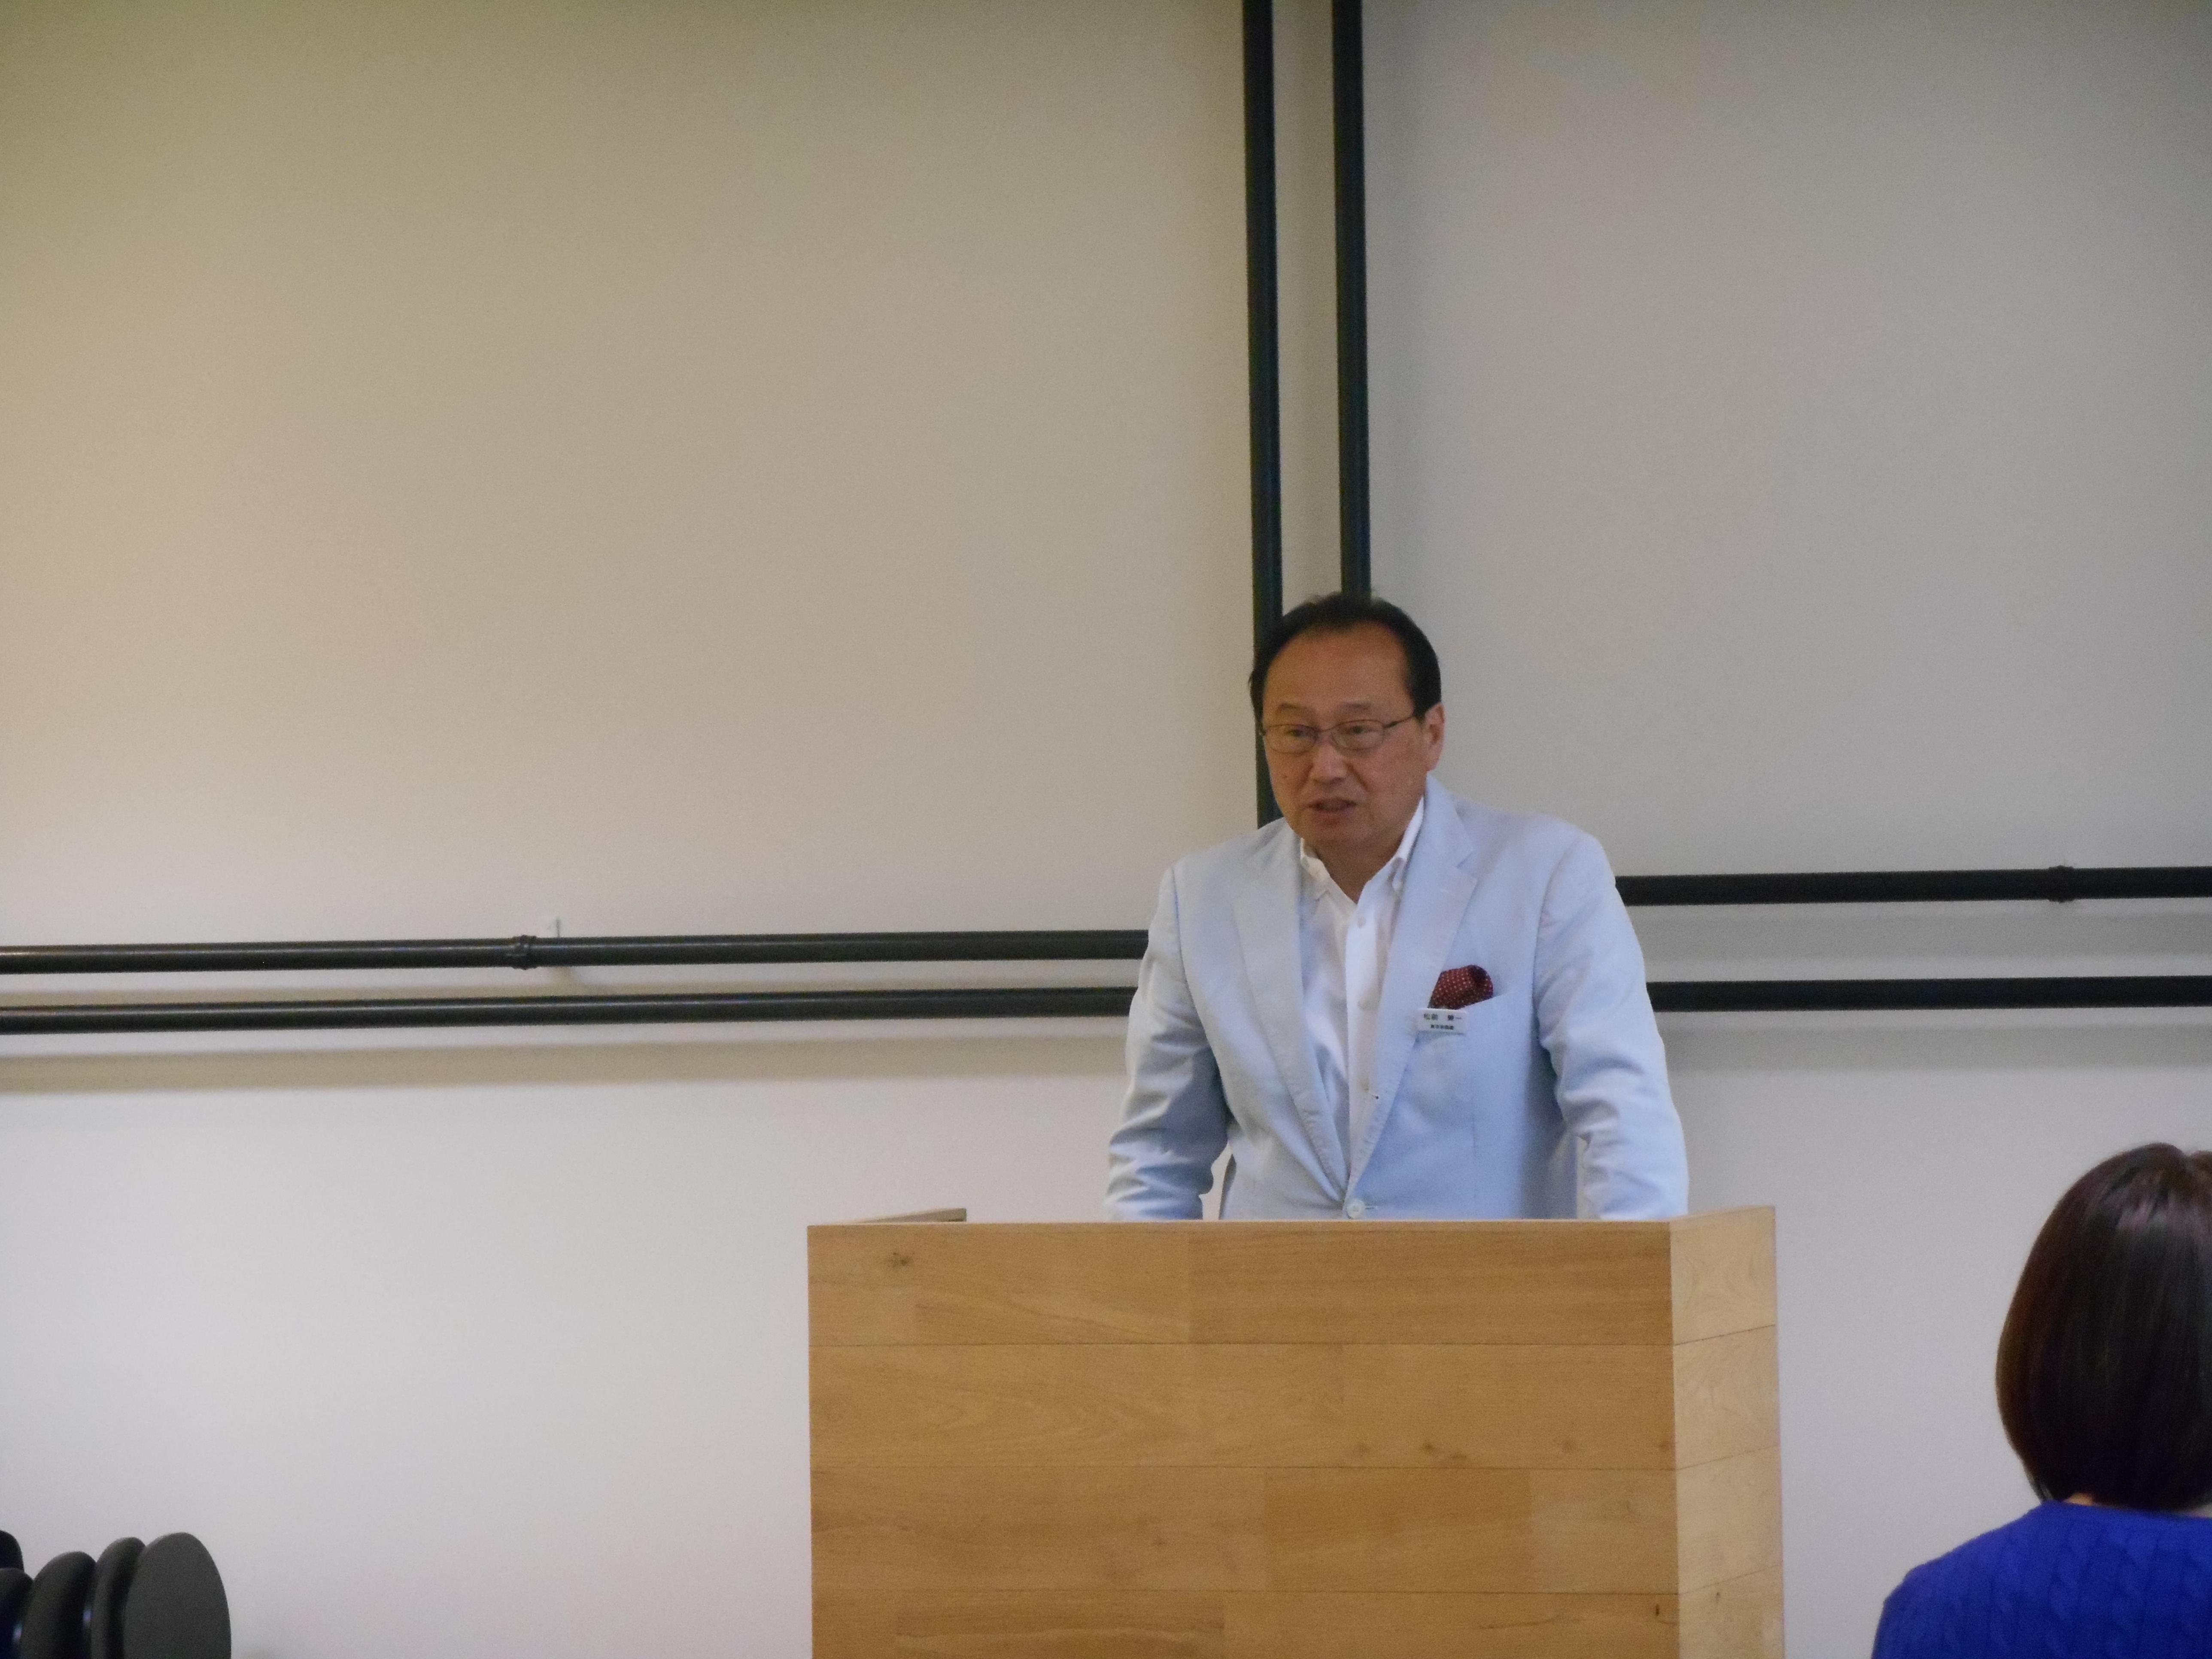 DSCN3701 - 平成30年度 東京思風塾 4月7日(土)「時代が問題をつくり、問題が人物をつくる」